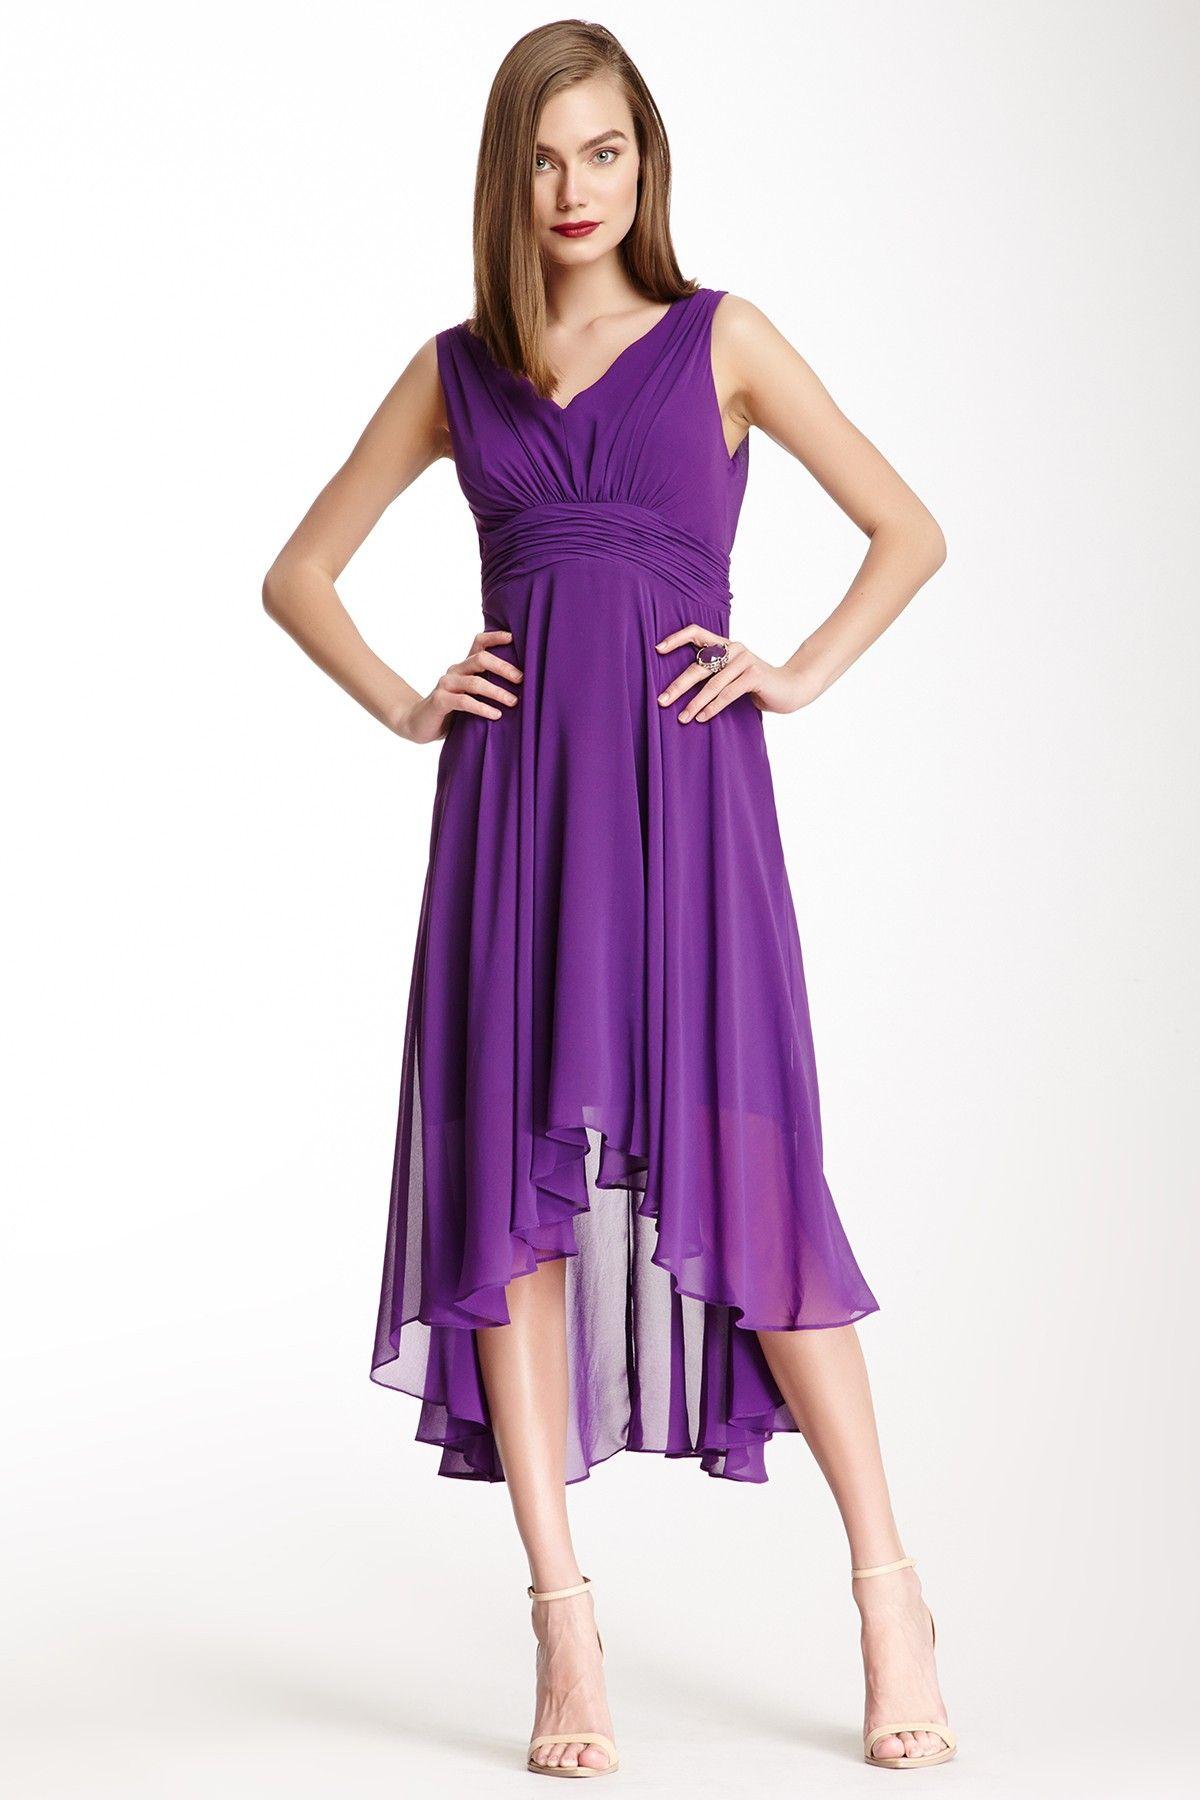 Purple | Moda Femenina | Pinterest | Moda estilo, Moda femenina y ...